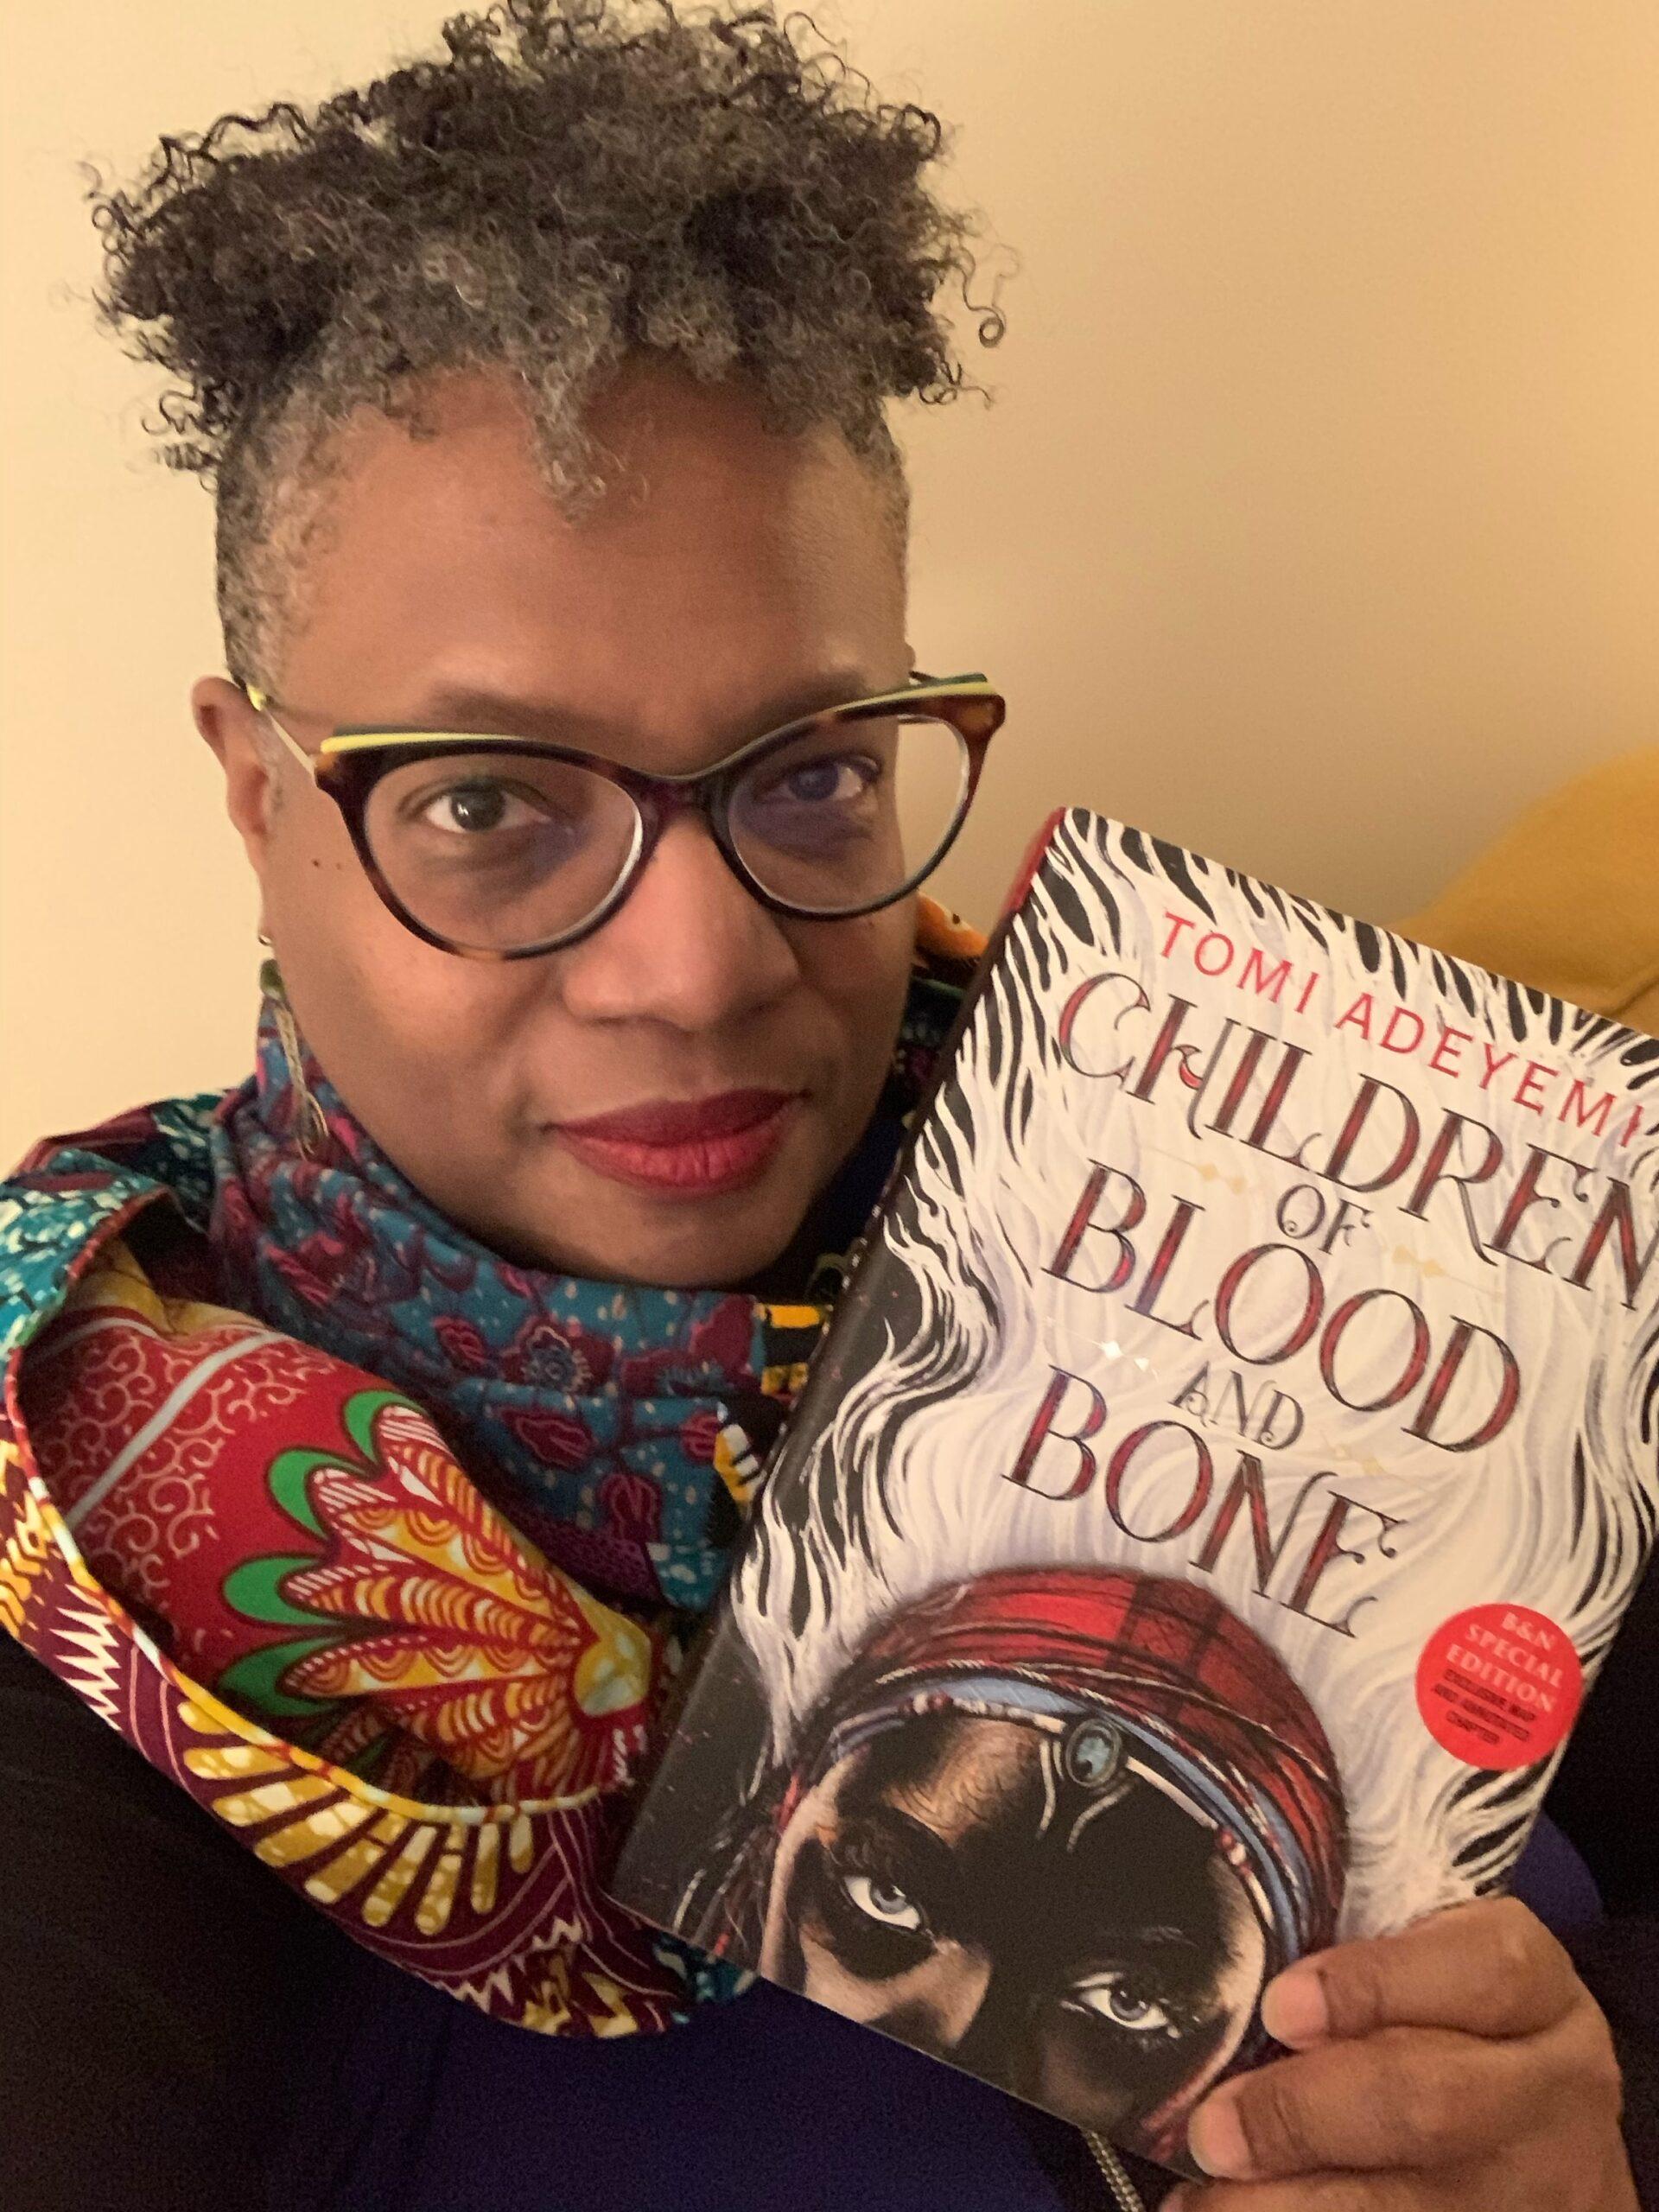 Children of Blood and Bone Erika Saunders